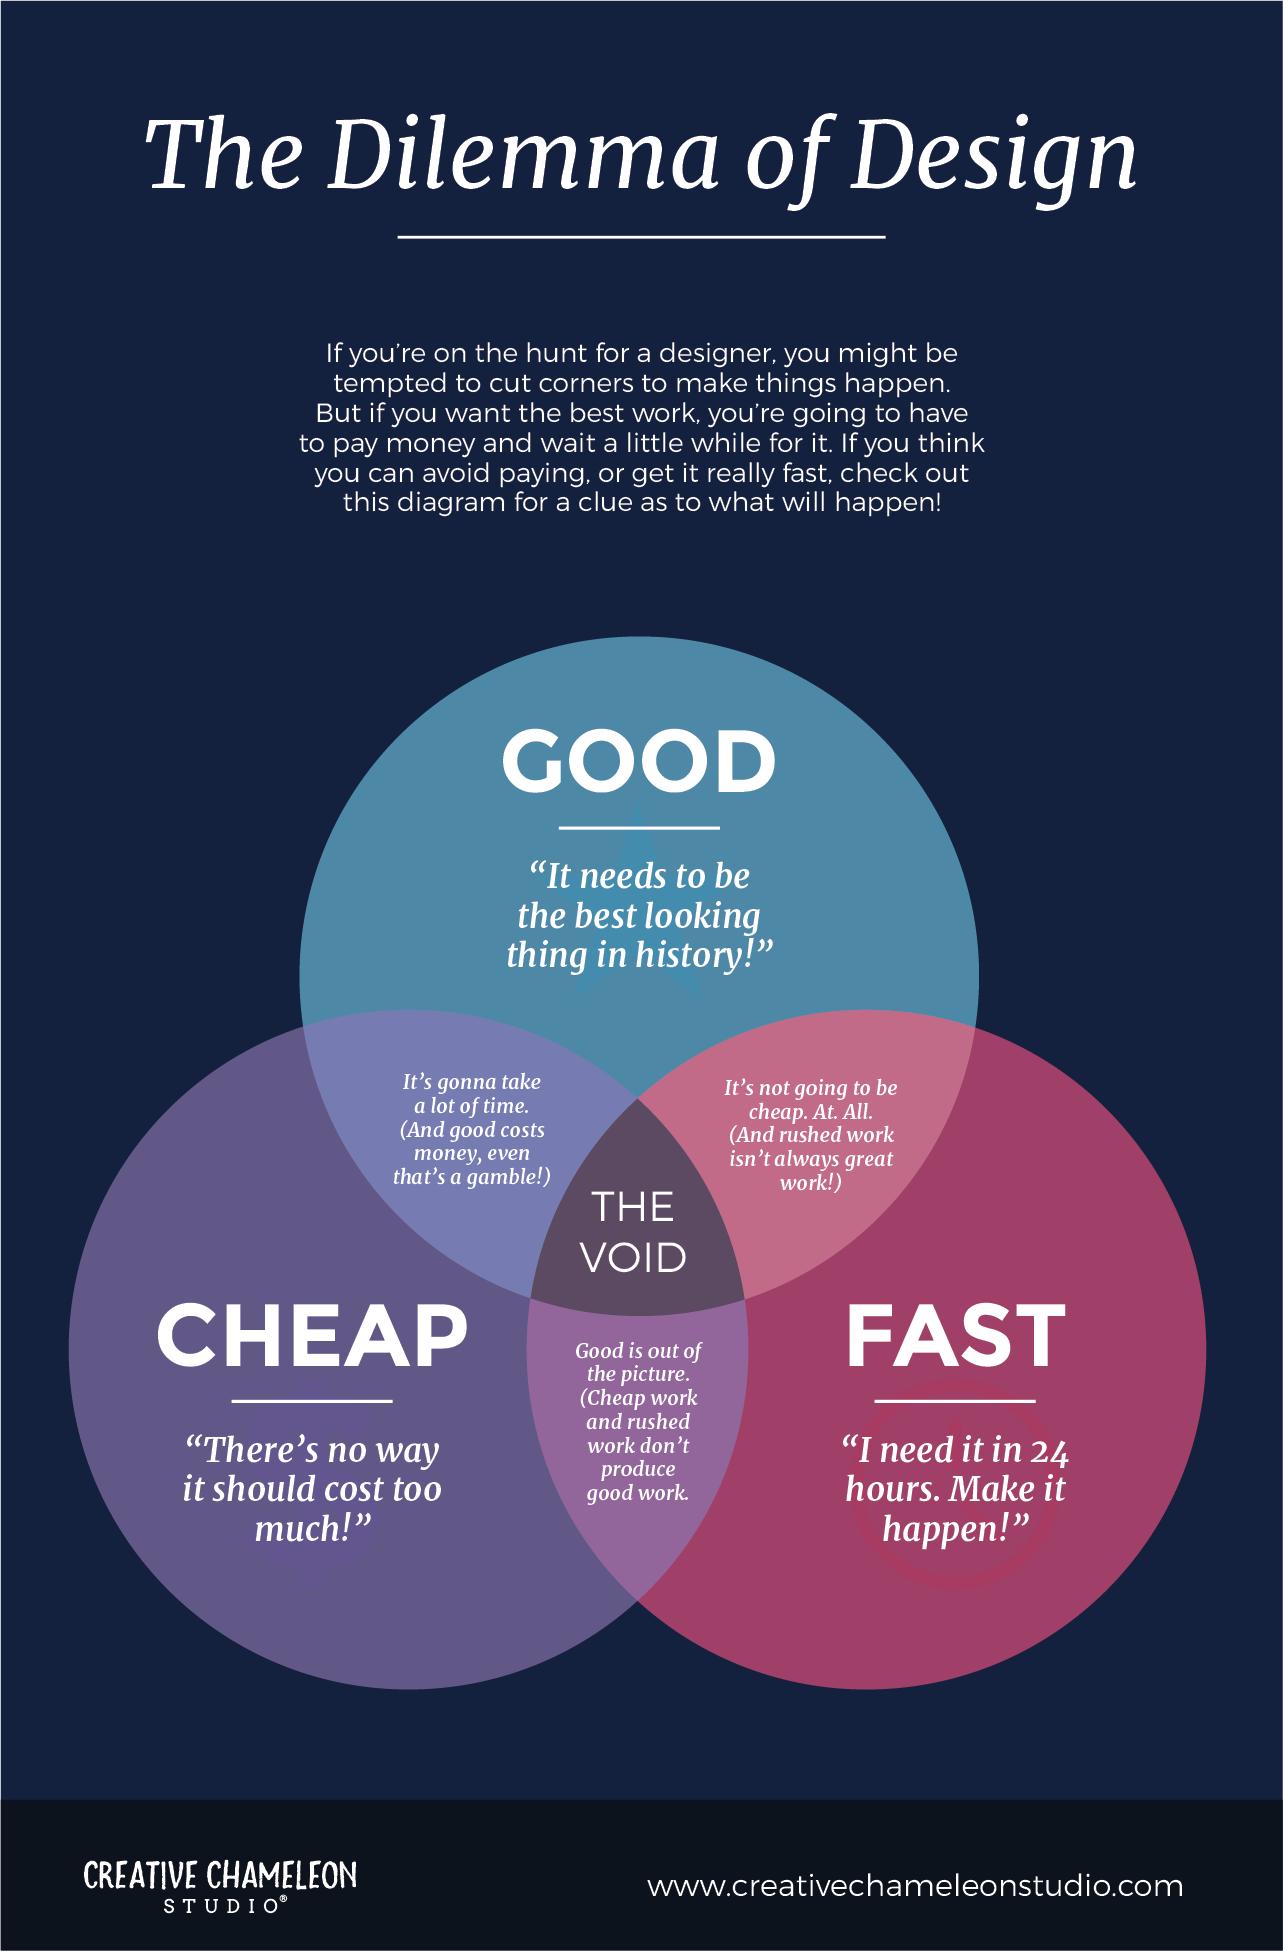 Why Should You Hire A Designer? – Creative Chameleon Studio